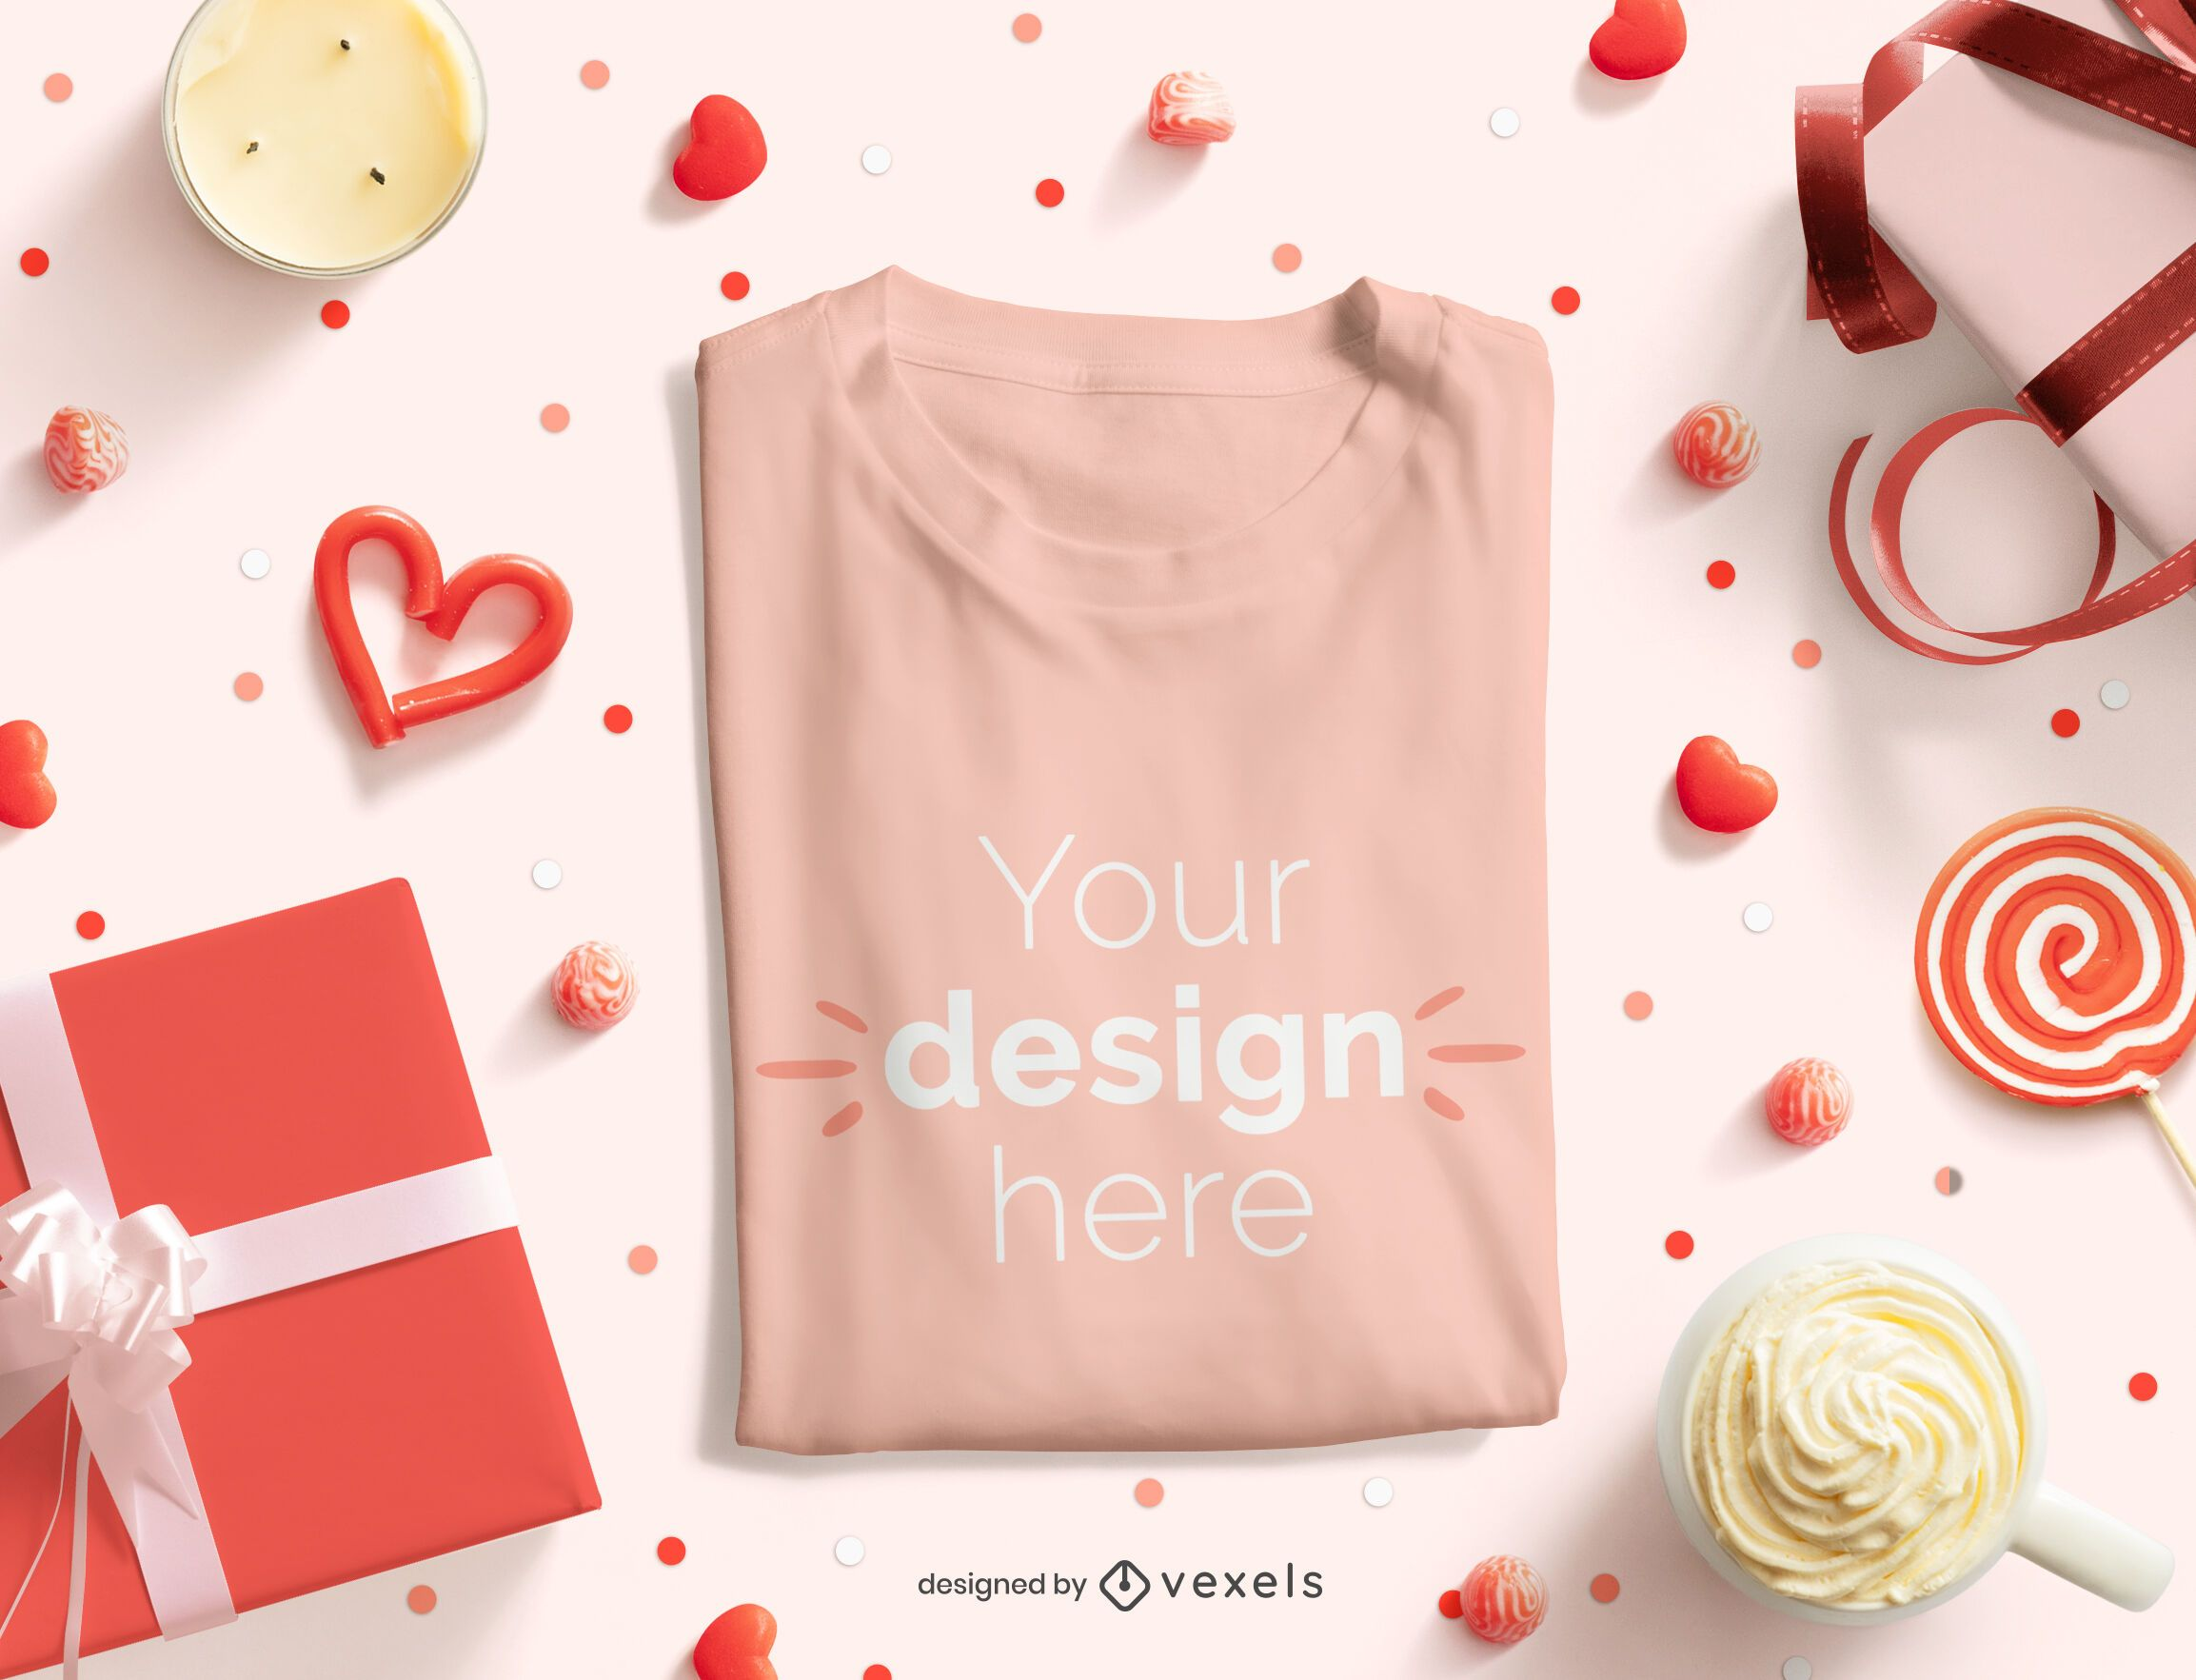 Composición de maqueta de camiseta doblada de san valentín